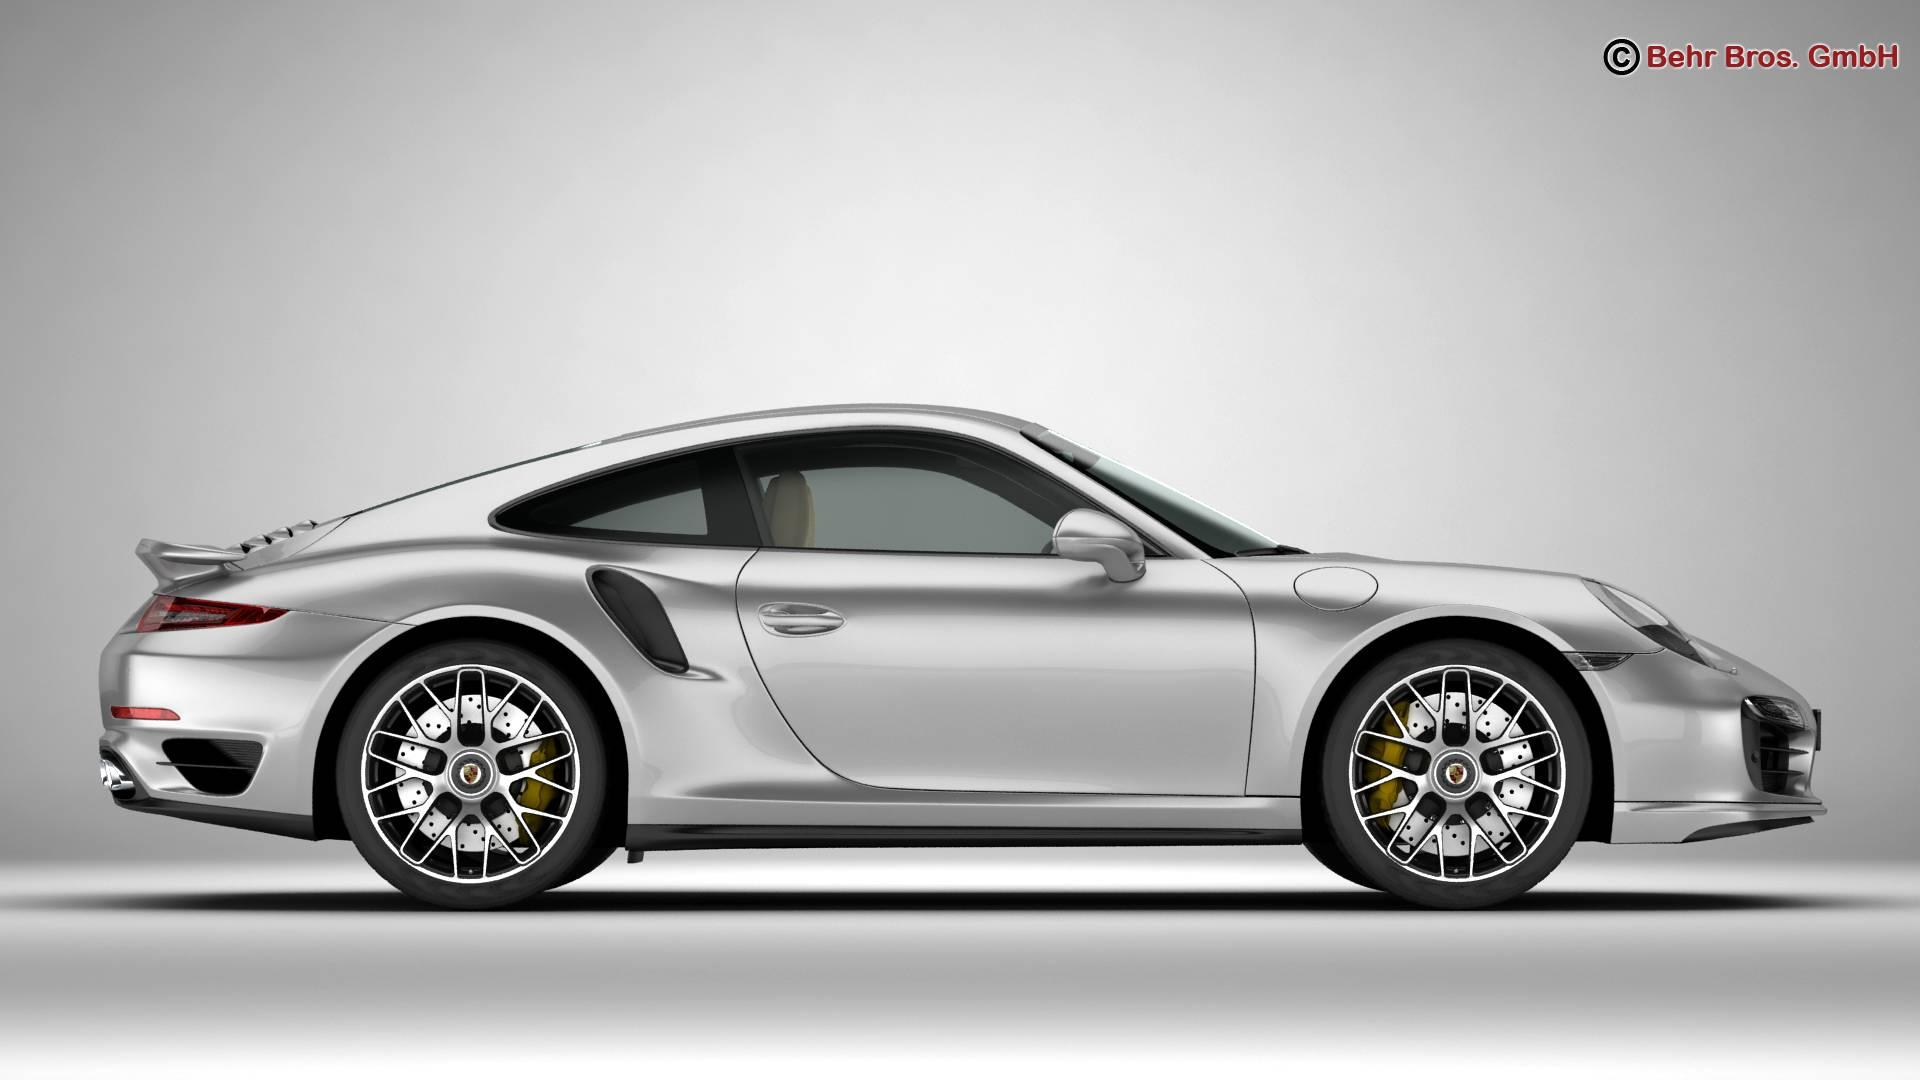 porsche 911 turbo s 2014 3d model 3ds max fbx c4d lwo ma mb obj 212480